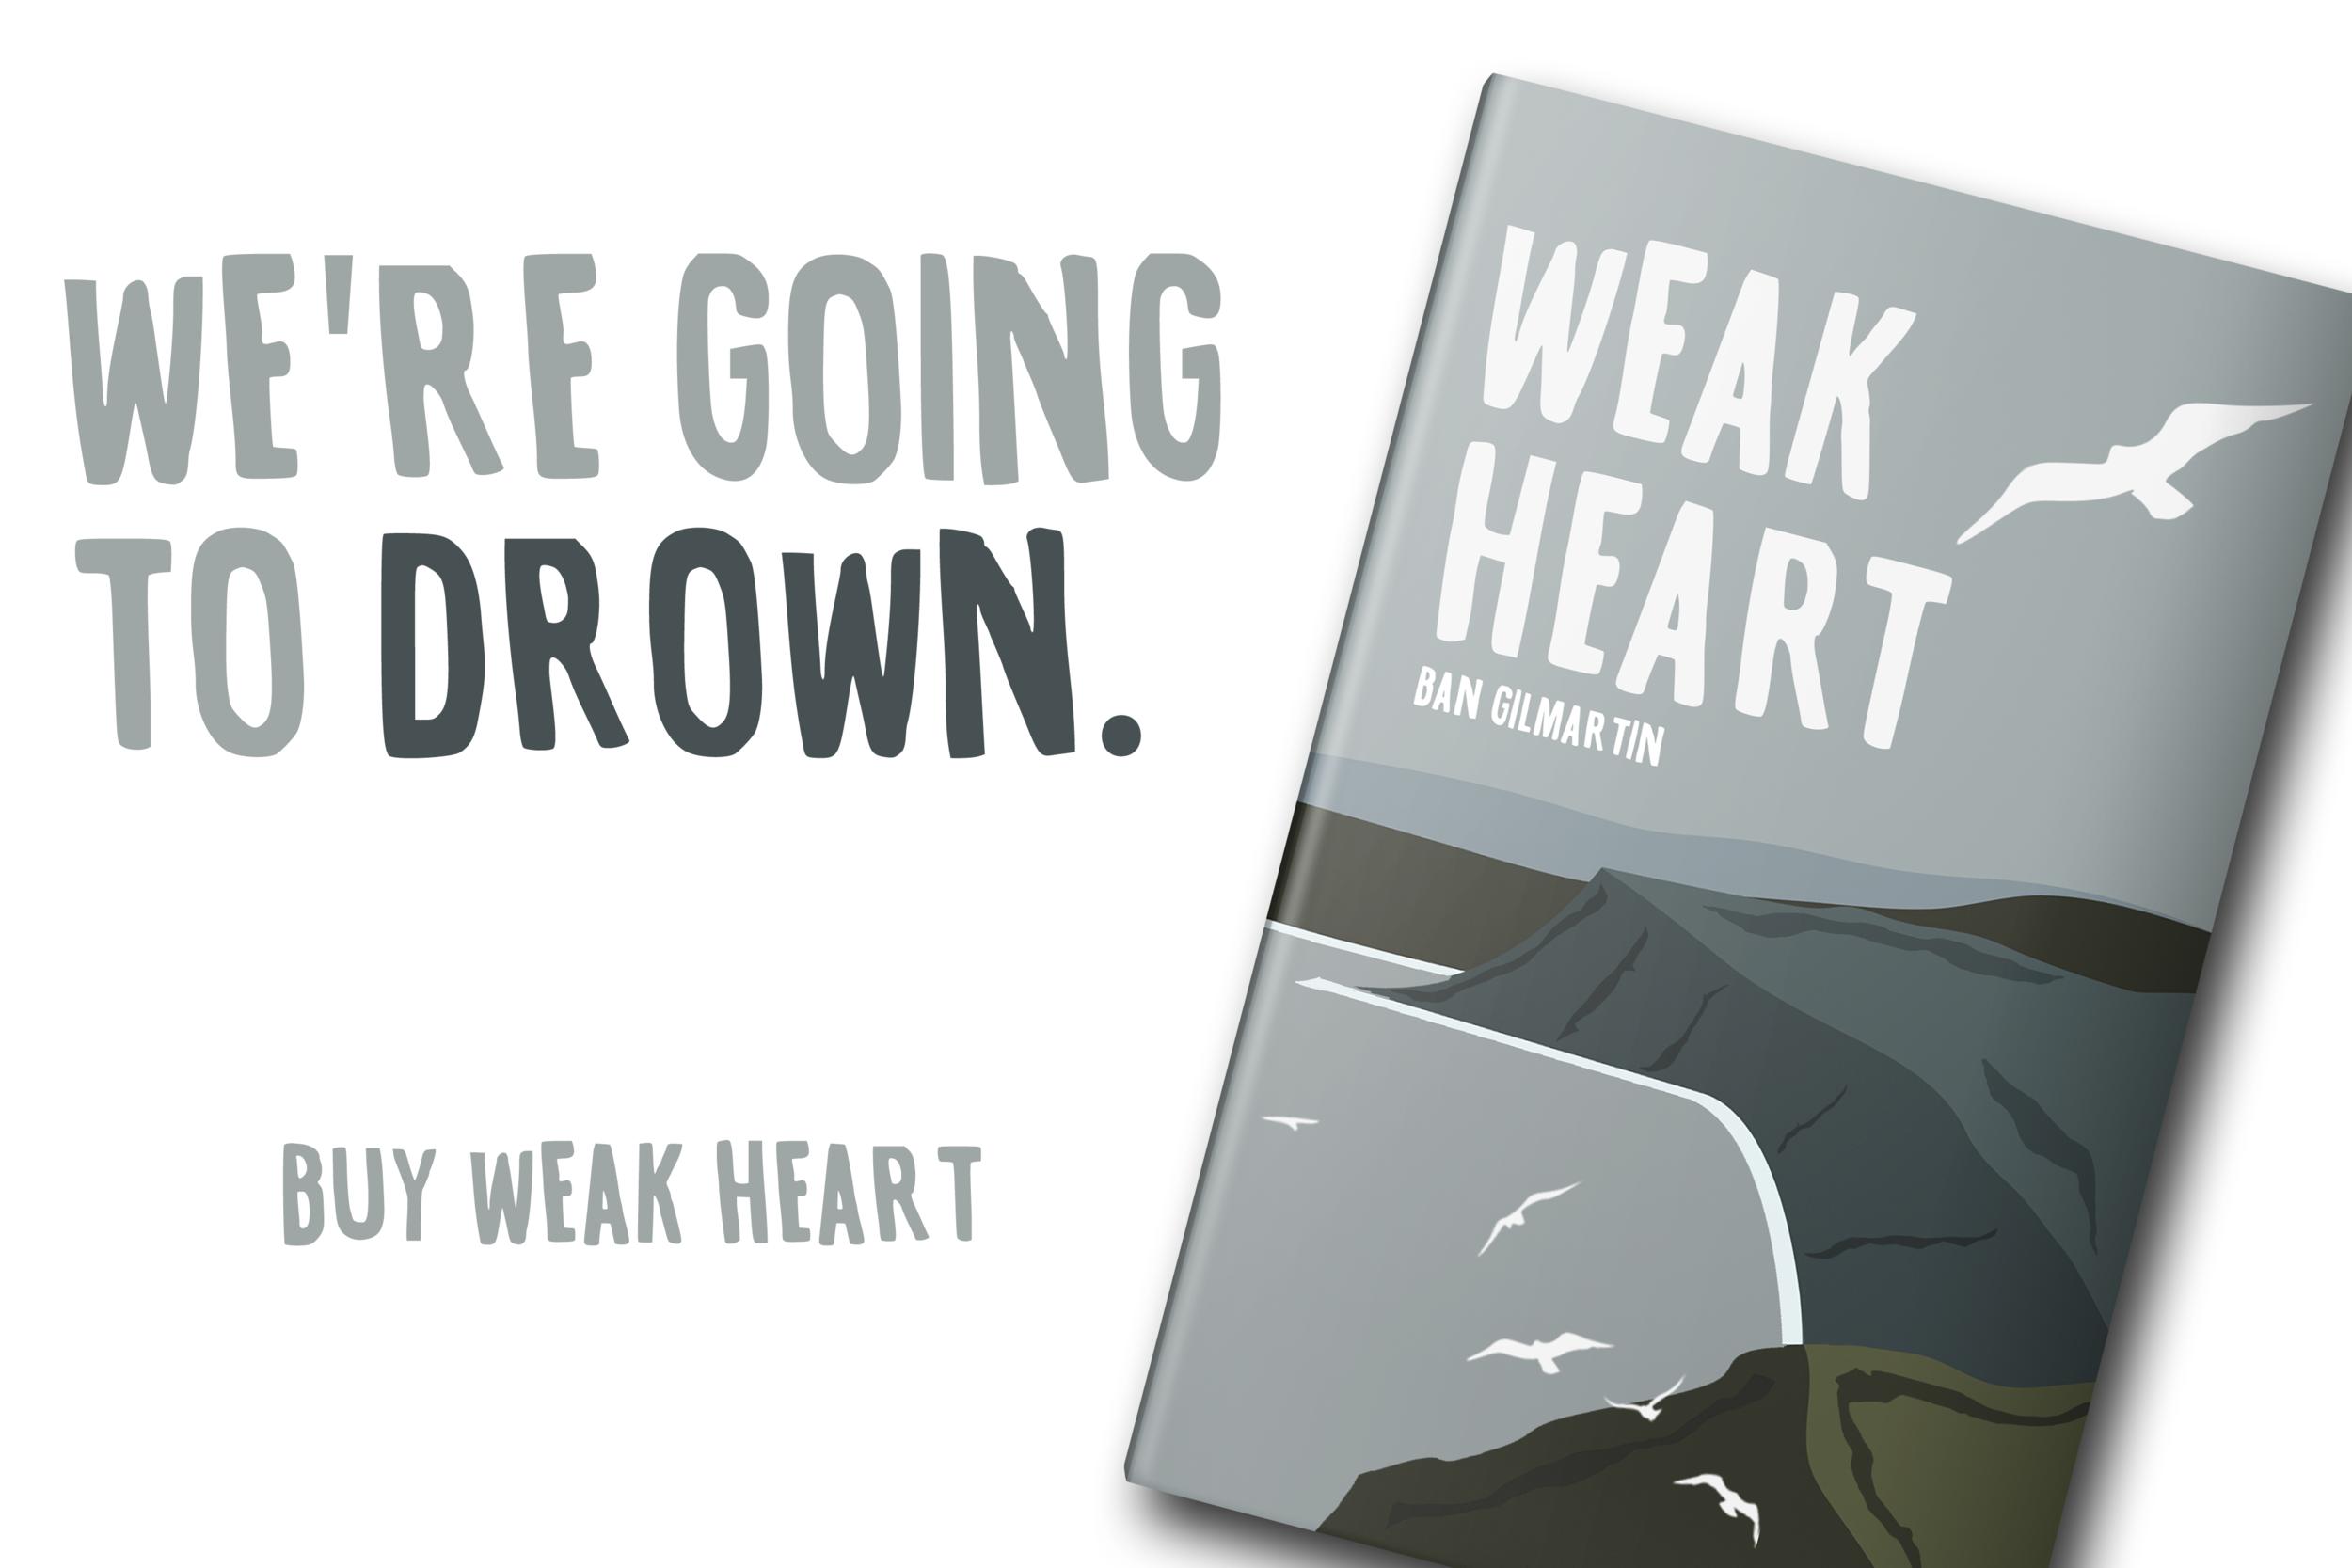 buy weak heart.png